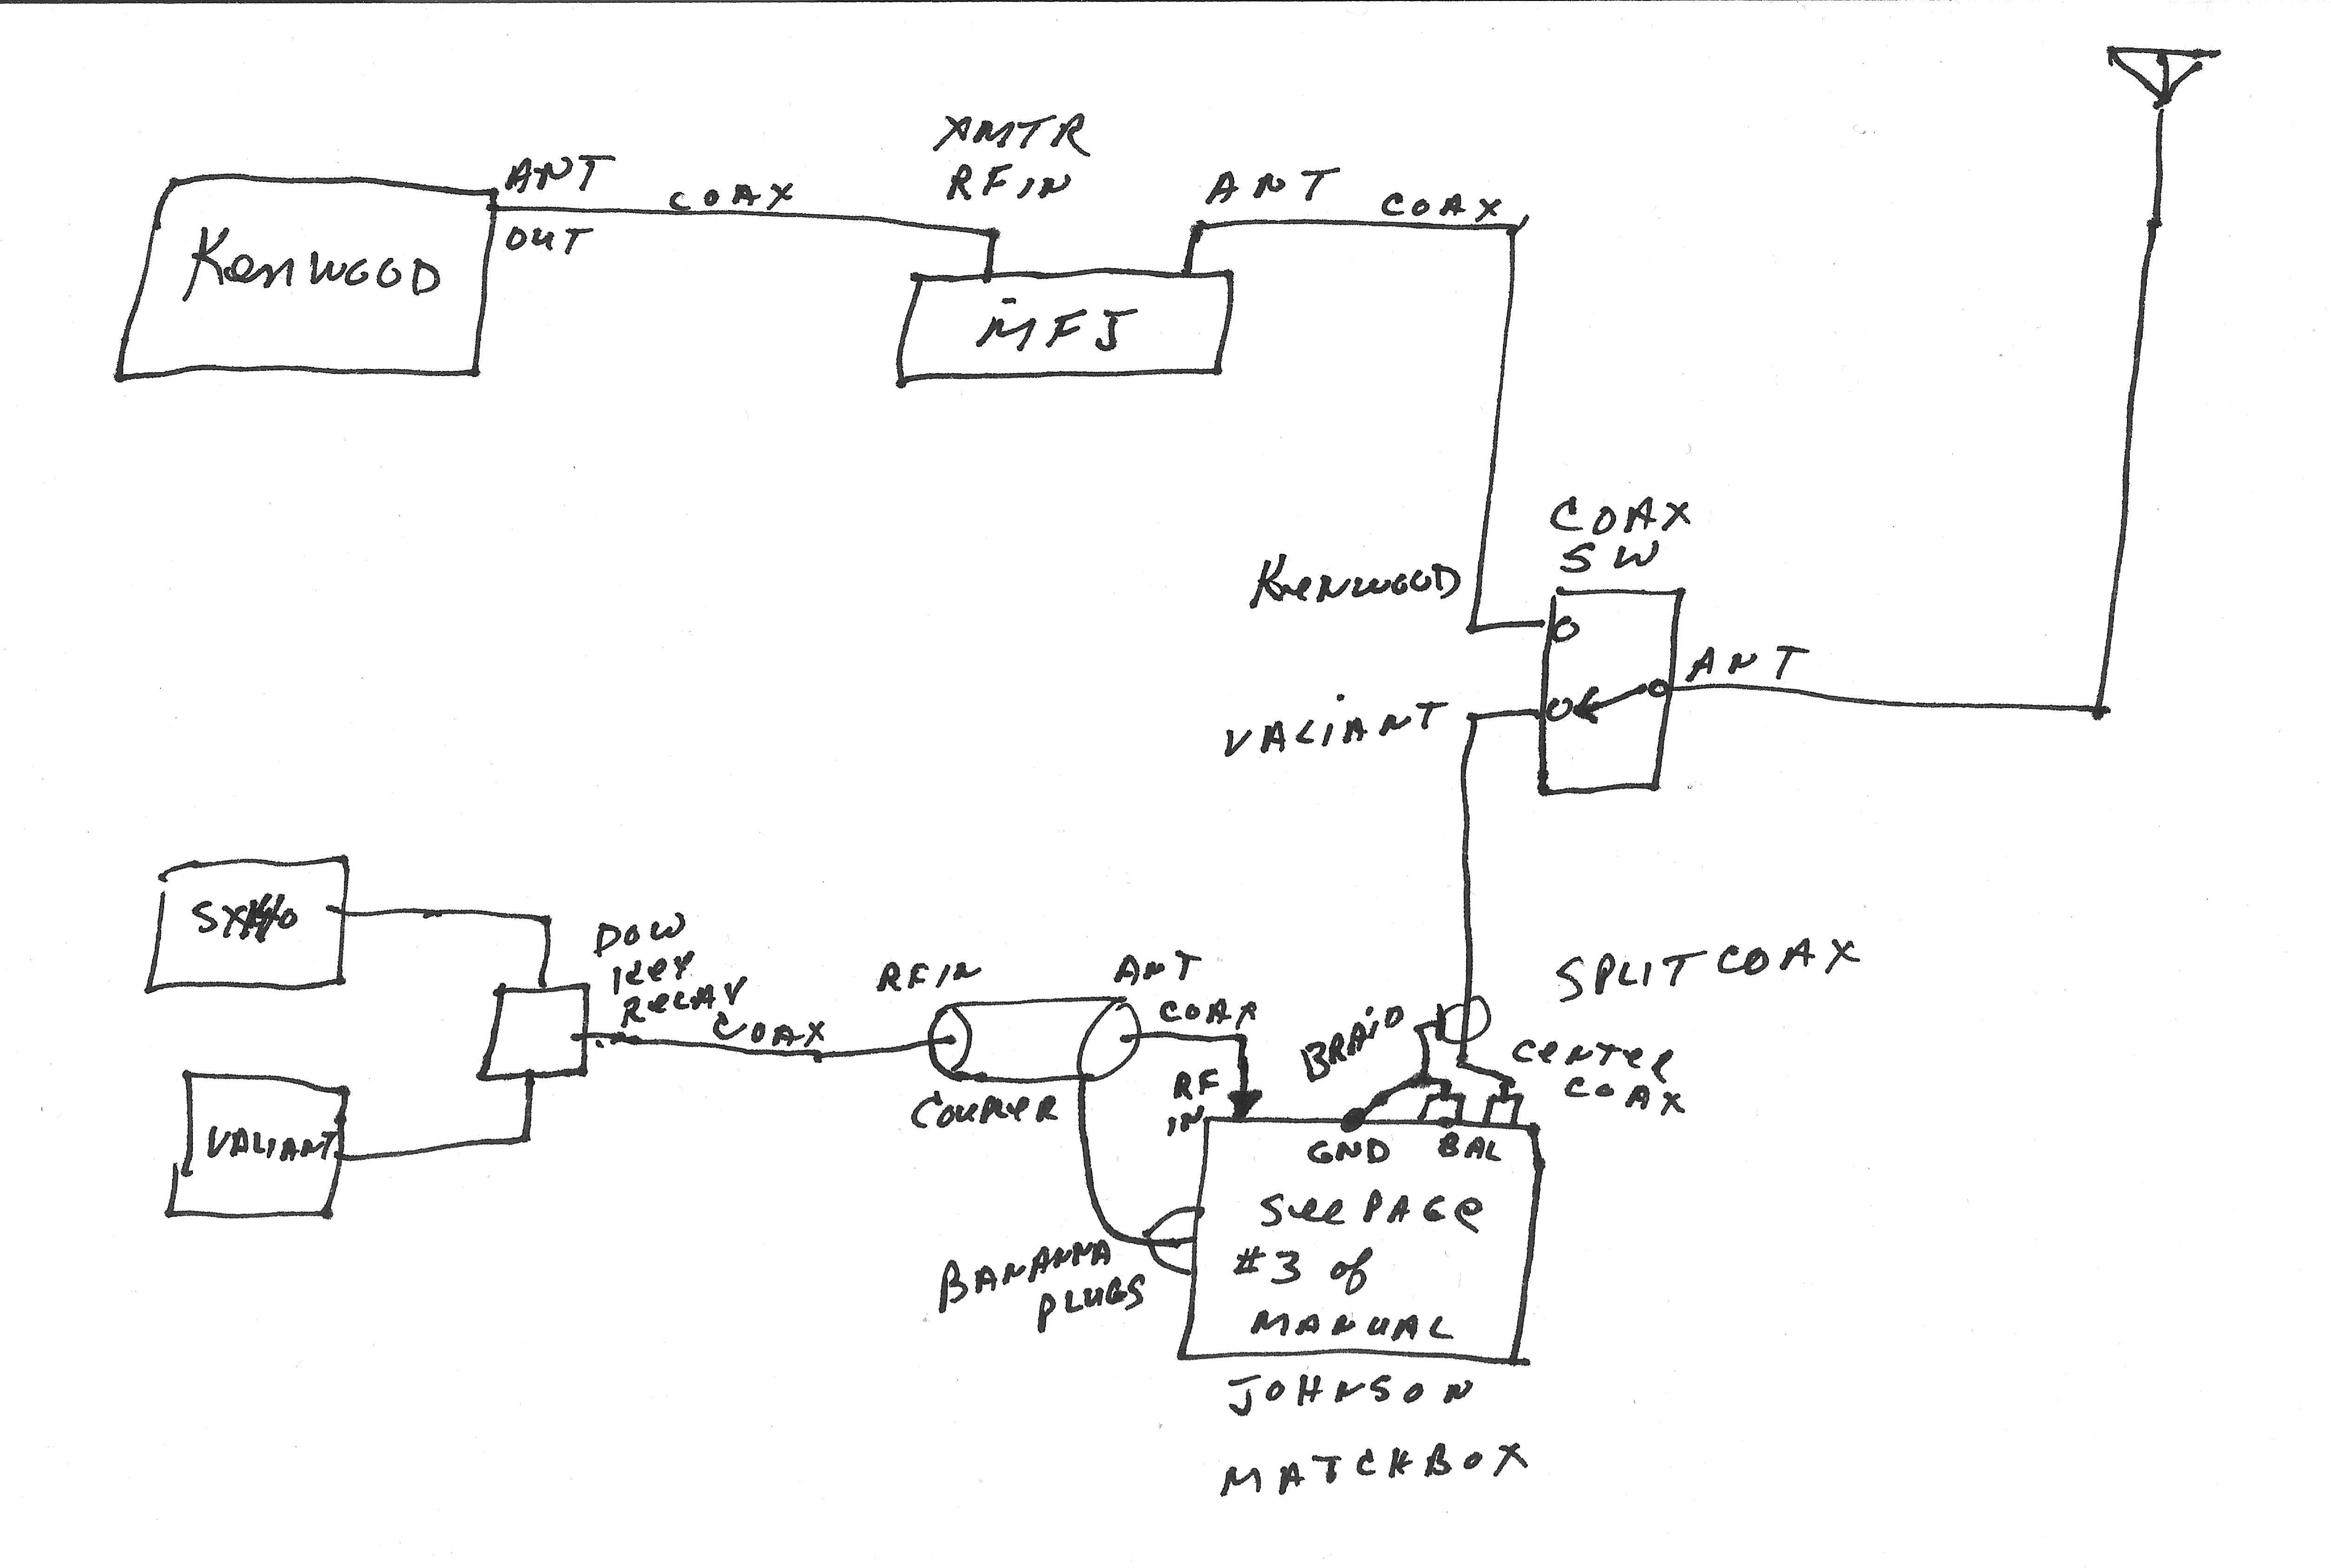 Unique Wiring Diagram 1990 Club Car Golf Cart #diagram #diagramtemplate  #diagramsamplePinterest